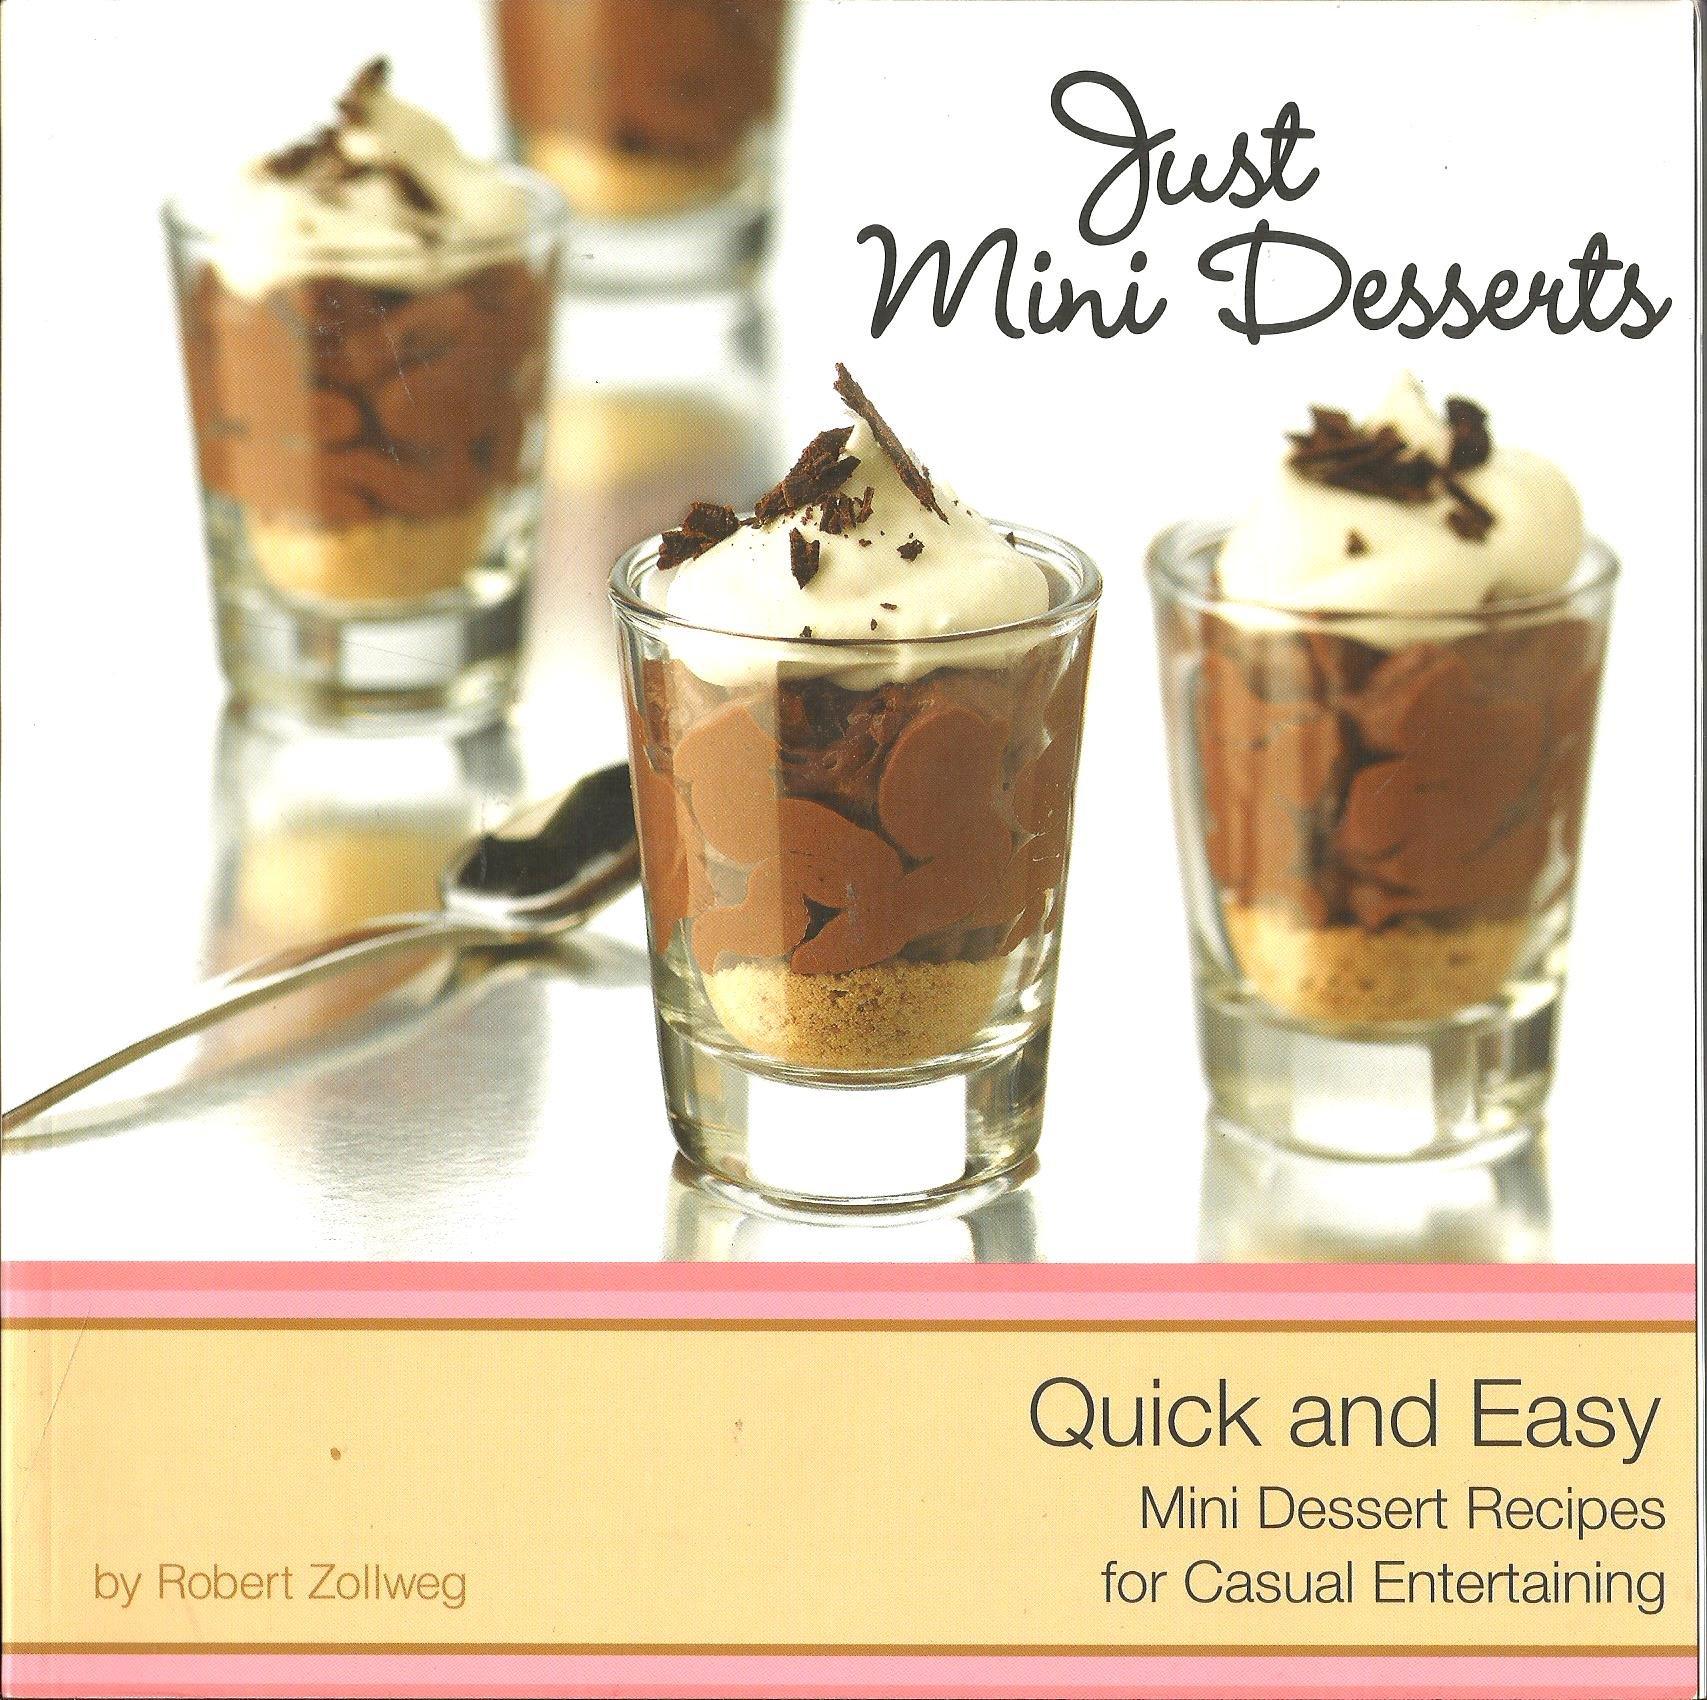 Just mini desserts quick and easy mini dessert recipes for casual just mini desserts quick and easy mini dessert recipes for casual entertaining robert zollweg 9780578058160 amazon books forumfinder Choice Image